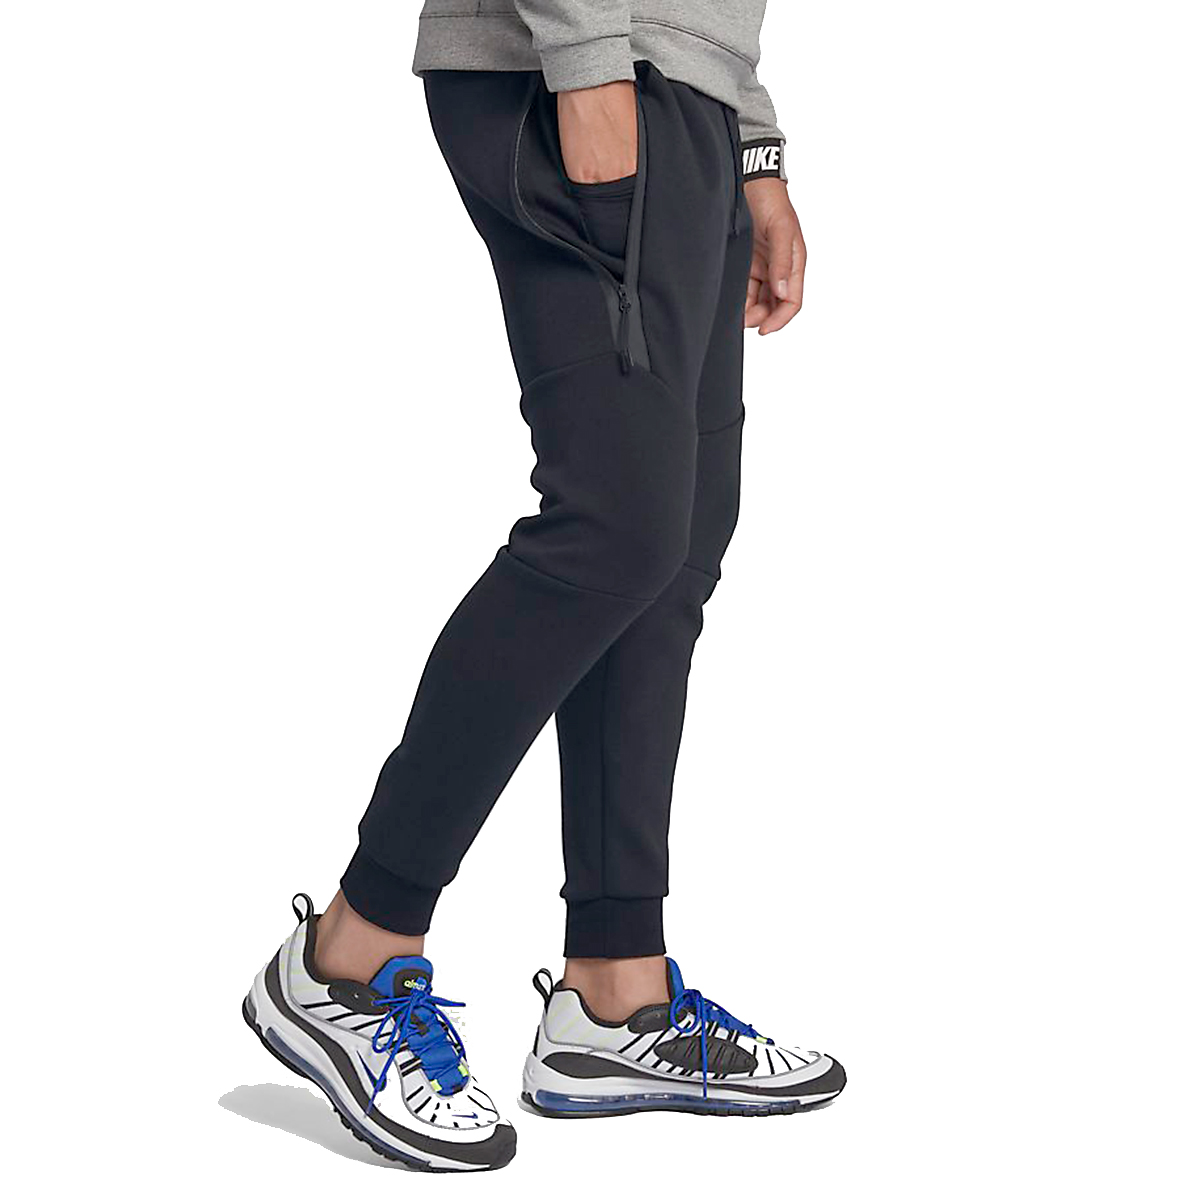 Men's Nike Tech Fleece Jogger  - Color: Black - Size: S, Black, large, image 2